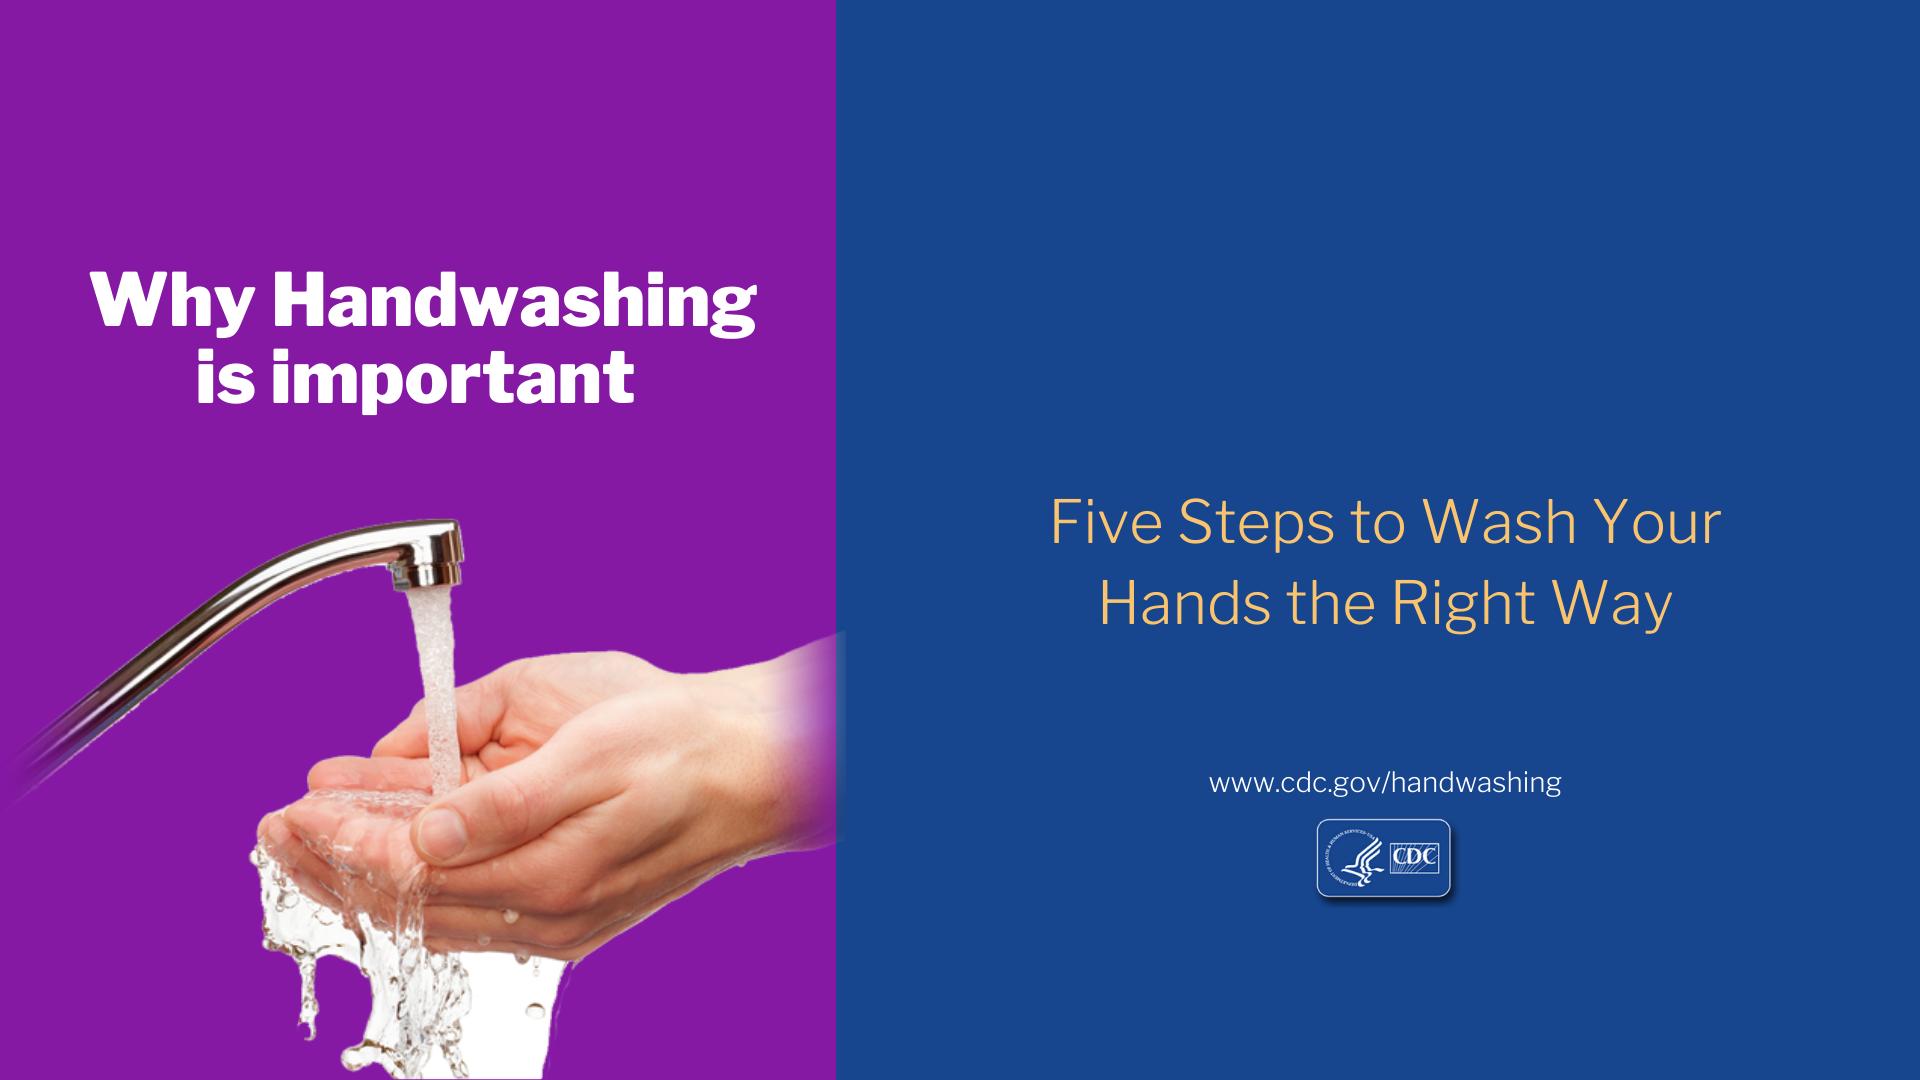 Global Handwashing Campaign